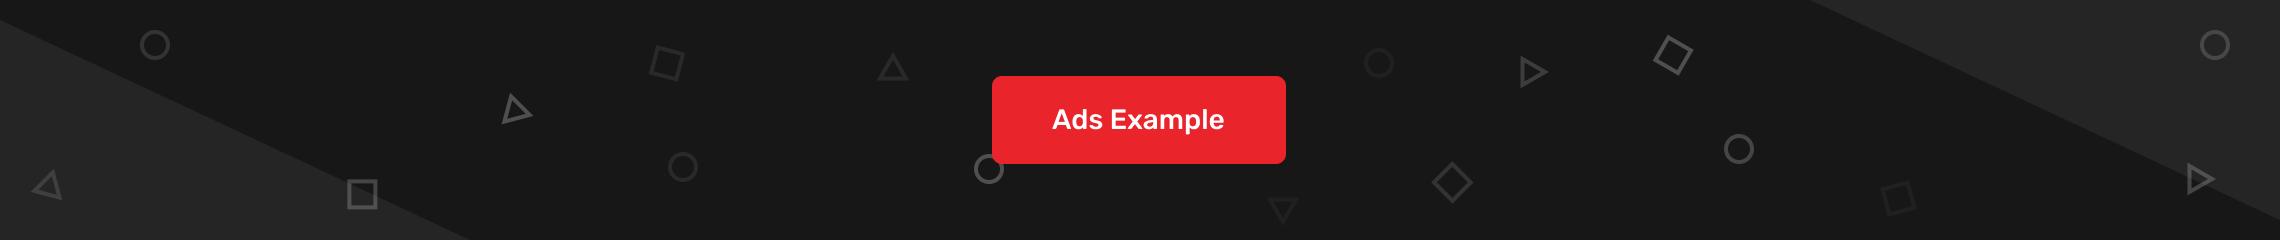 CyberPulse Ads